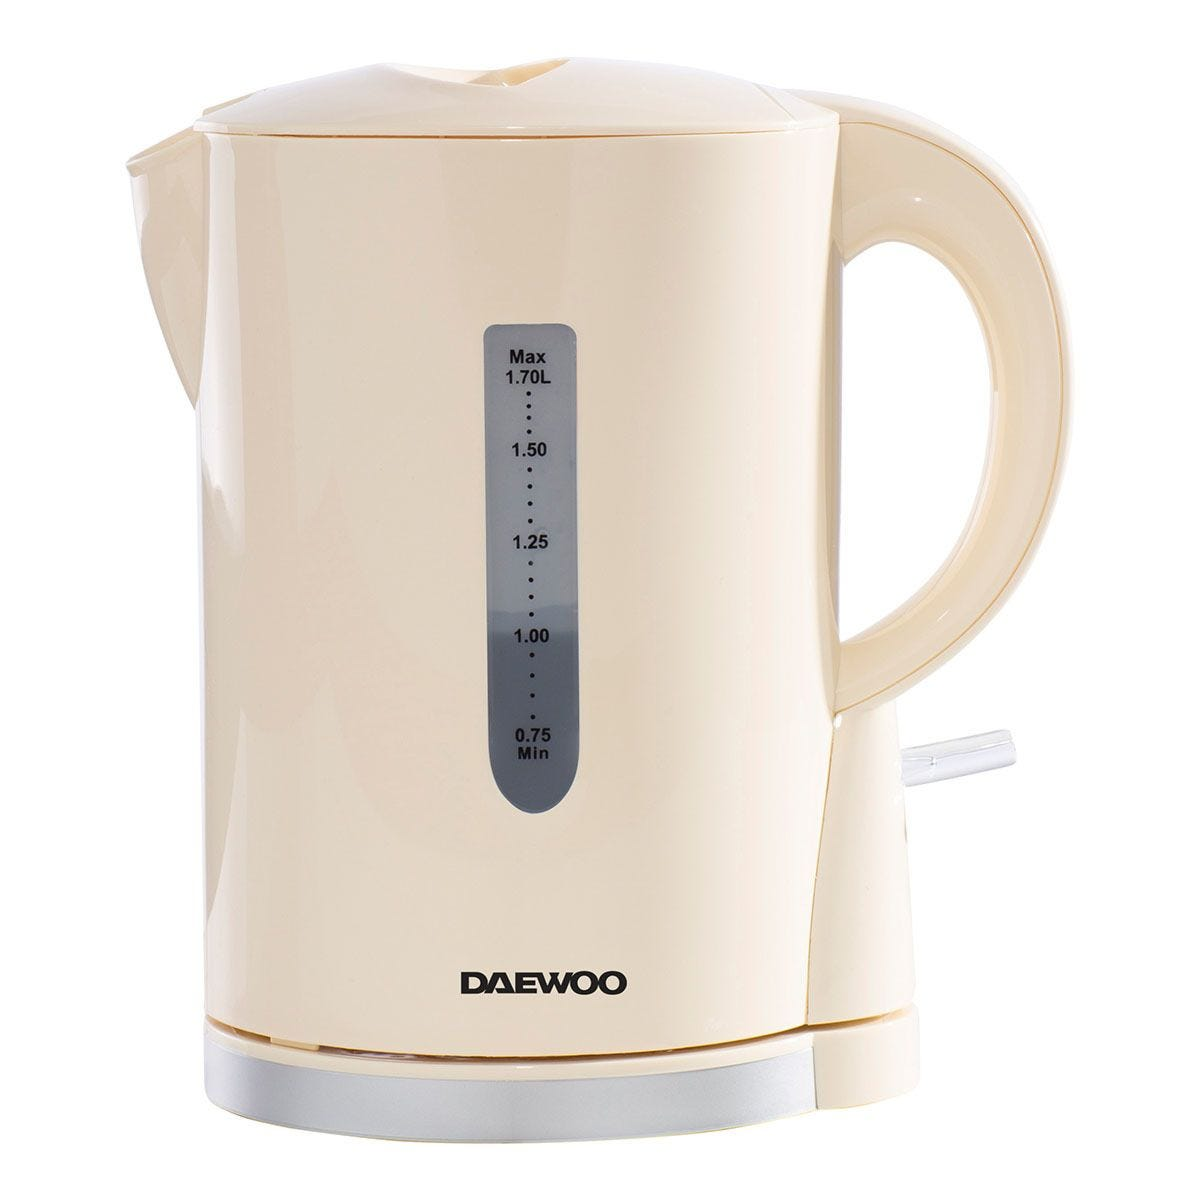 Daewoo 1.7L 2200W Plastic Kettle - Cream with Chrome Band